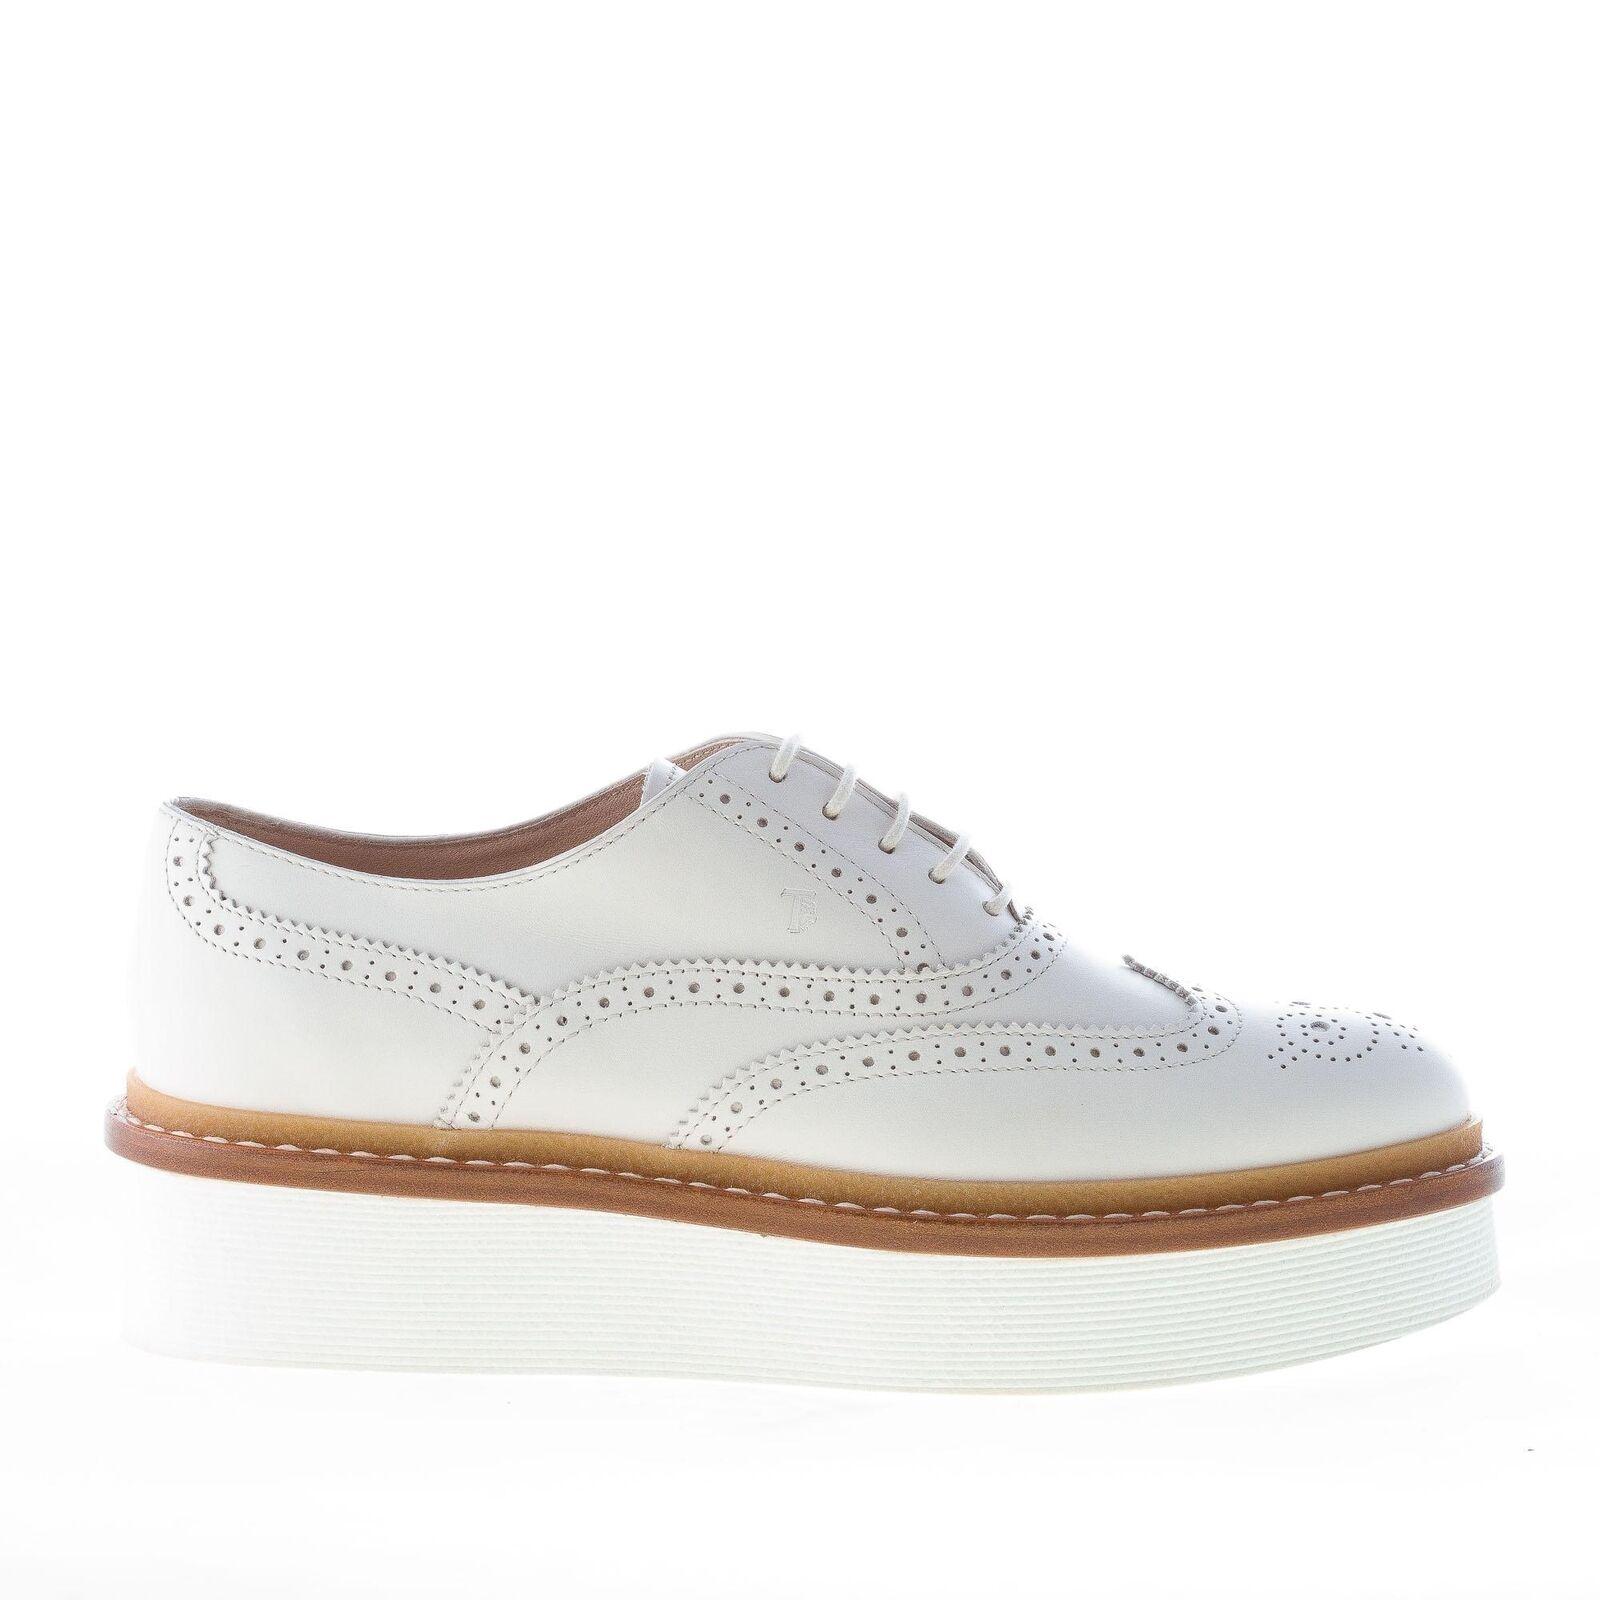 TOD'S women shoes White leather laced brogues oxford with platform platform platform 6fbde7